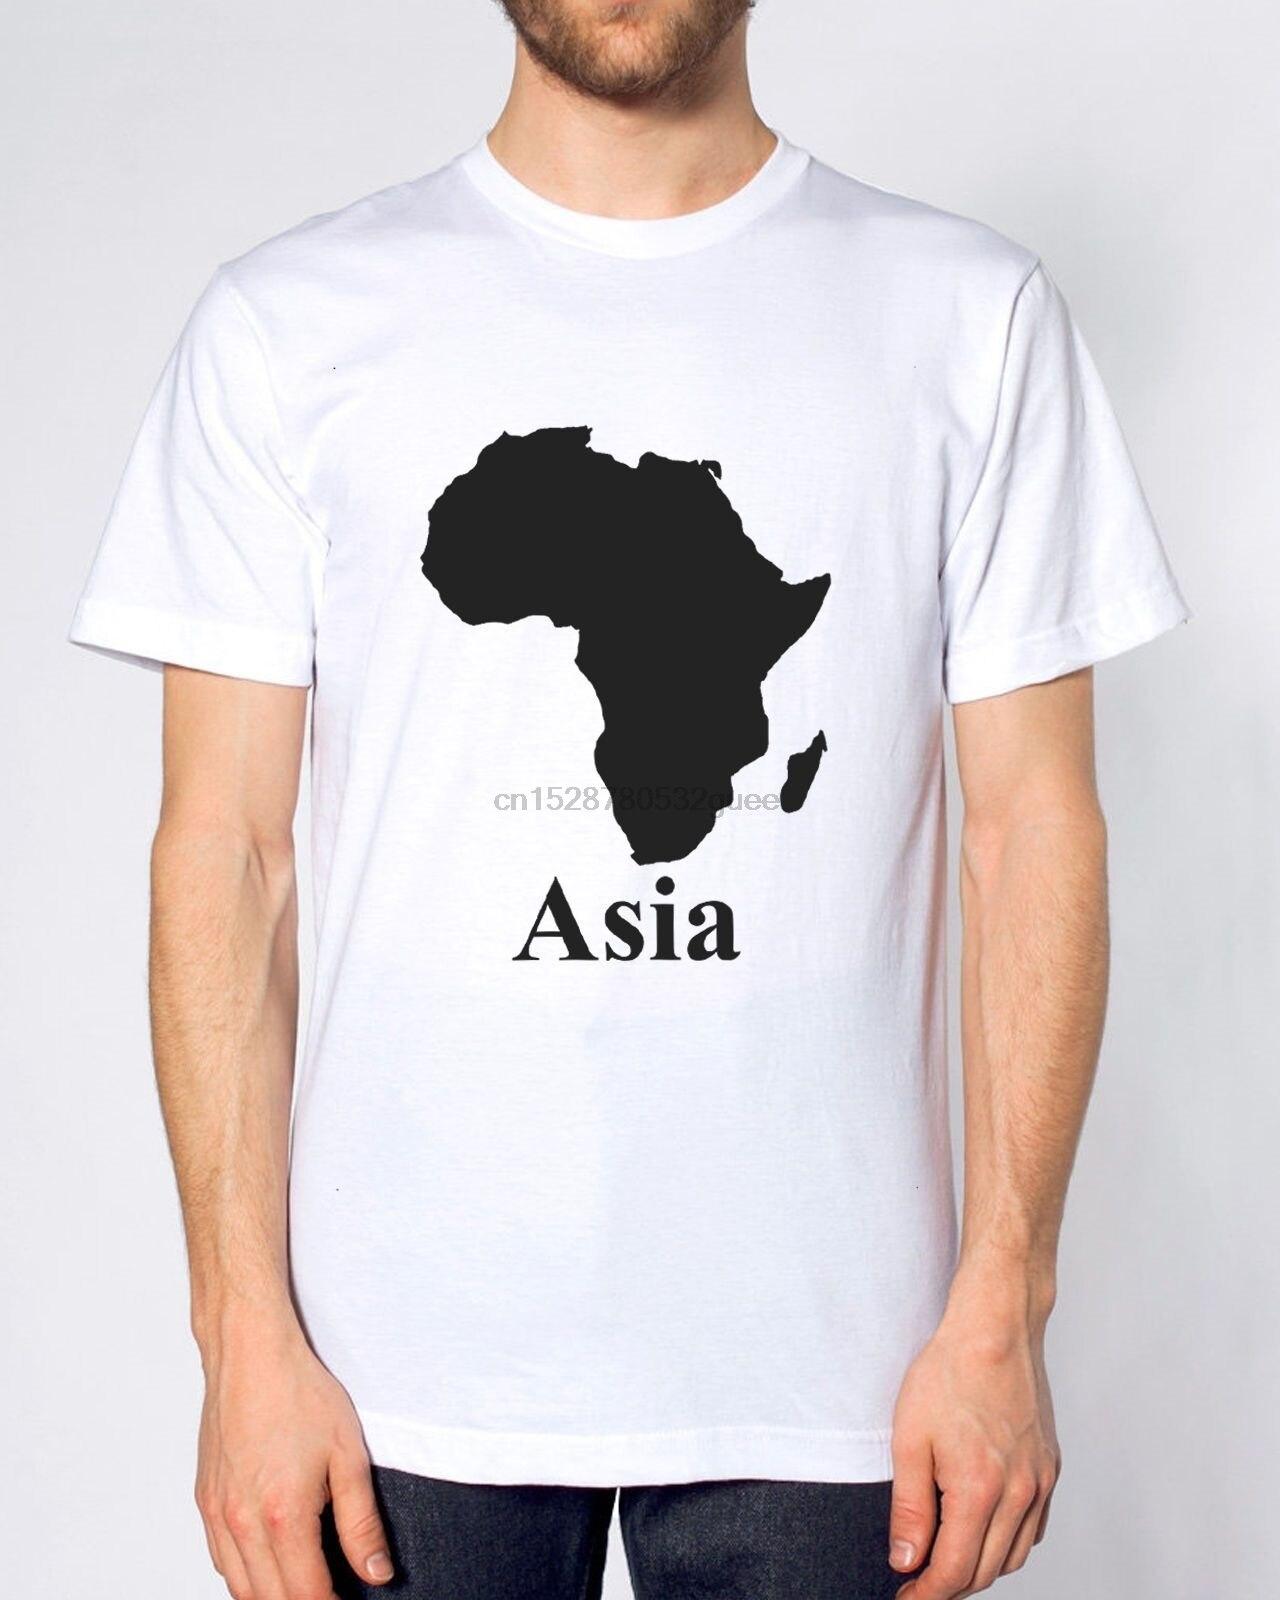 Camiseta África Asia divertida parodia mapa hombres mujeres niños Cool Casual Pride camiseta hombres Unisex nueva moda camiseta divertida Tops